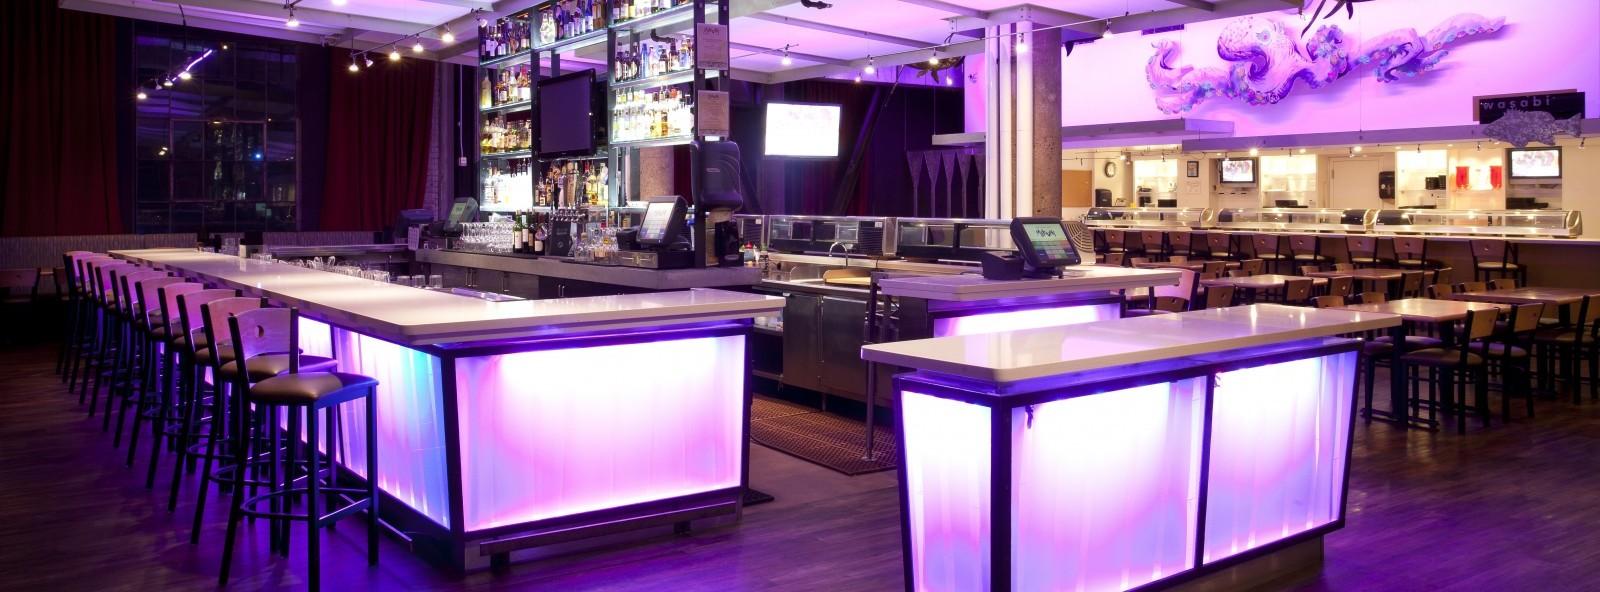 Midtown Beverage Bar 9500 E1423510802458 Jpg